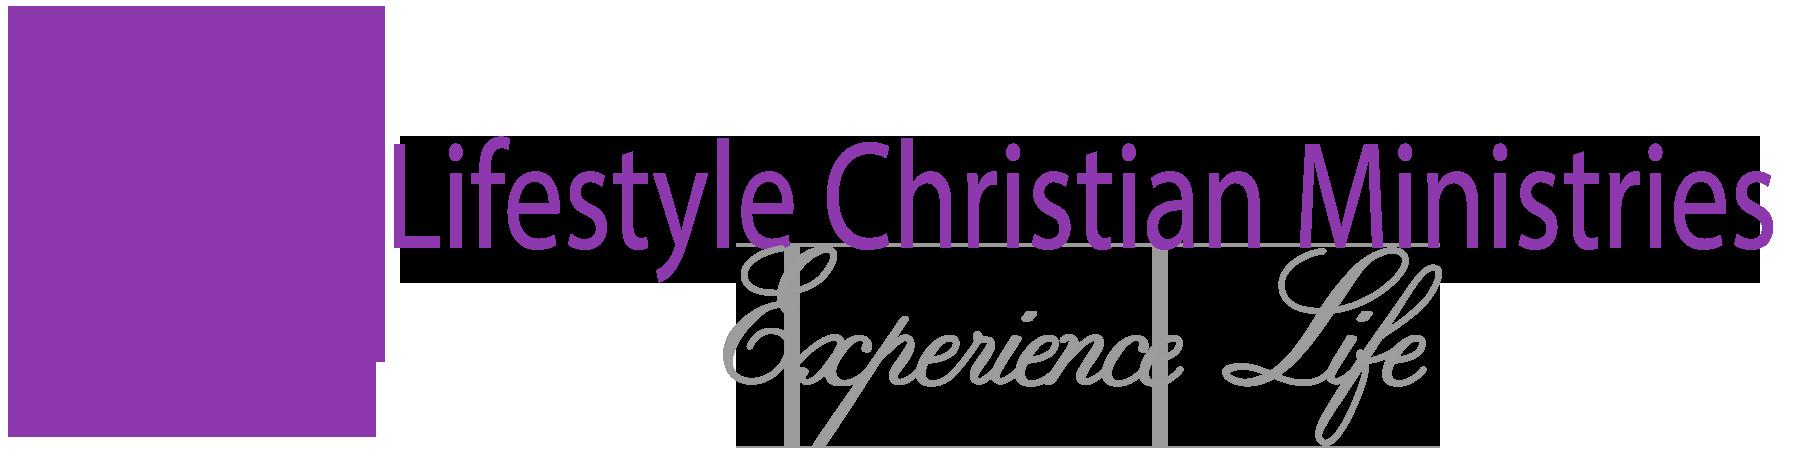 Lifestyle Christian Ministries